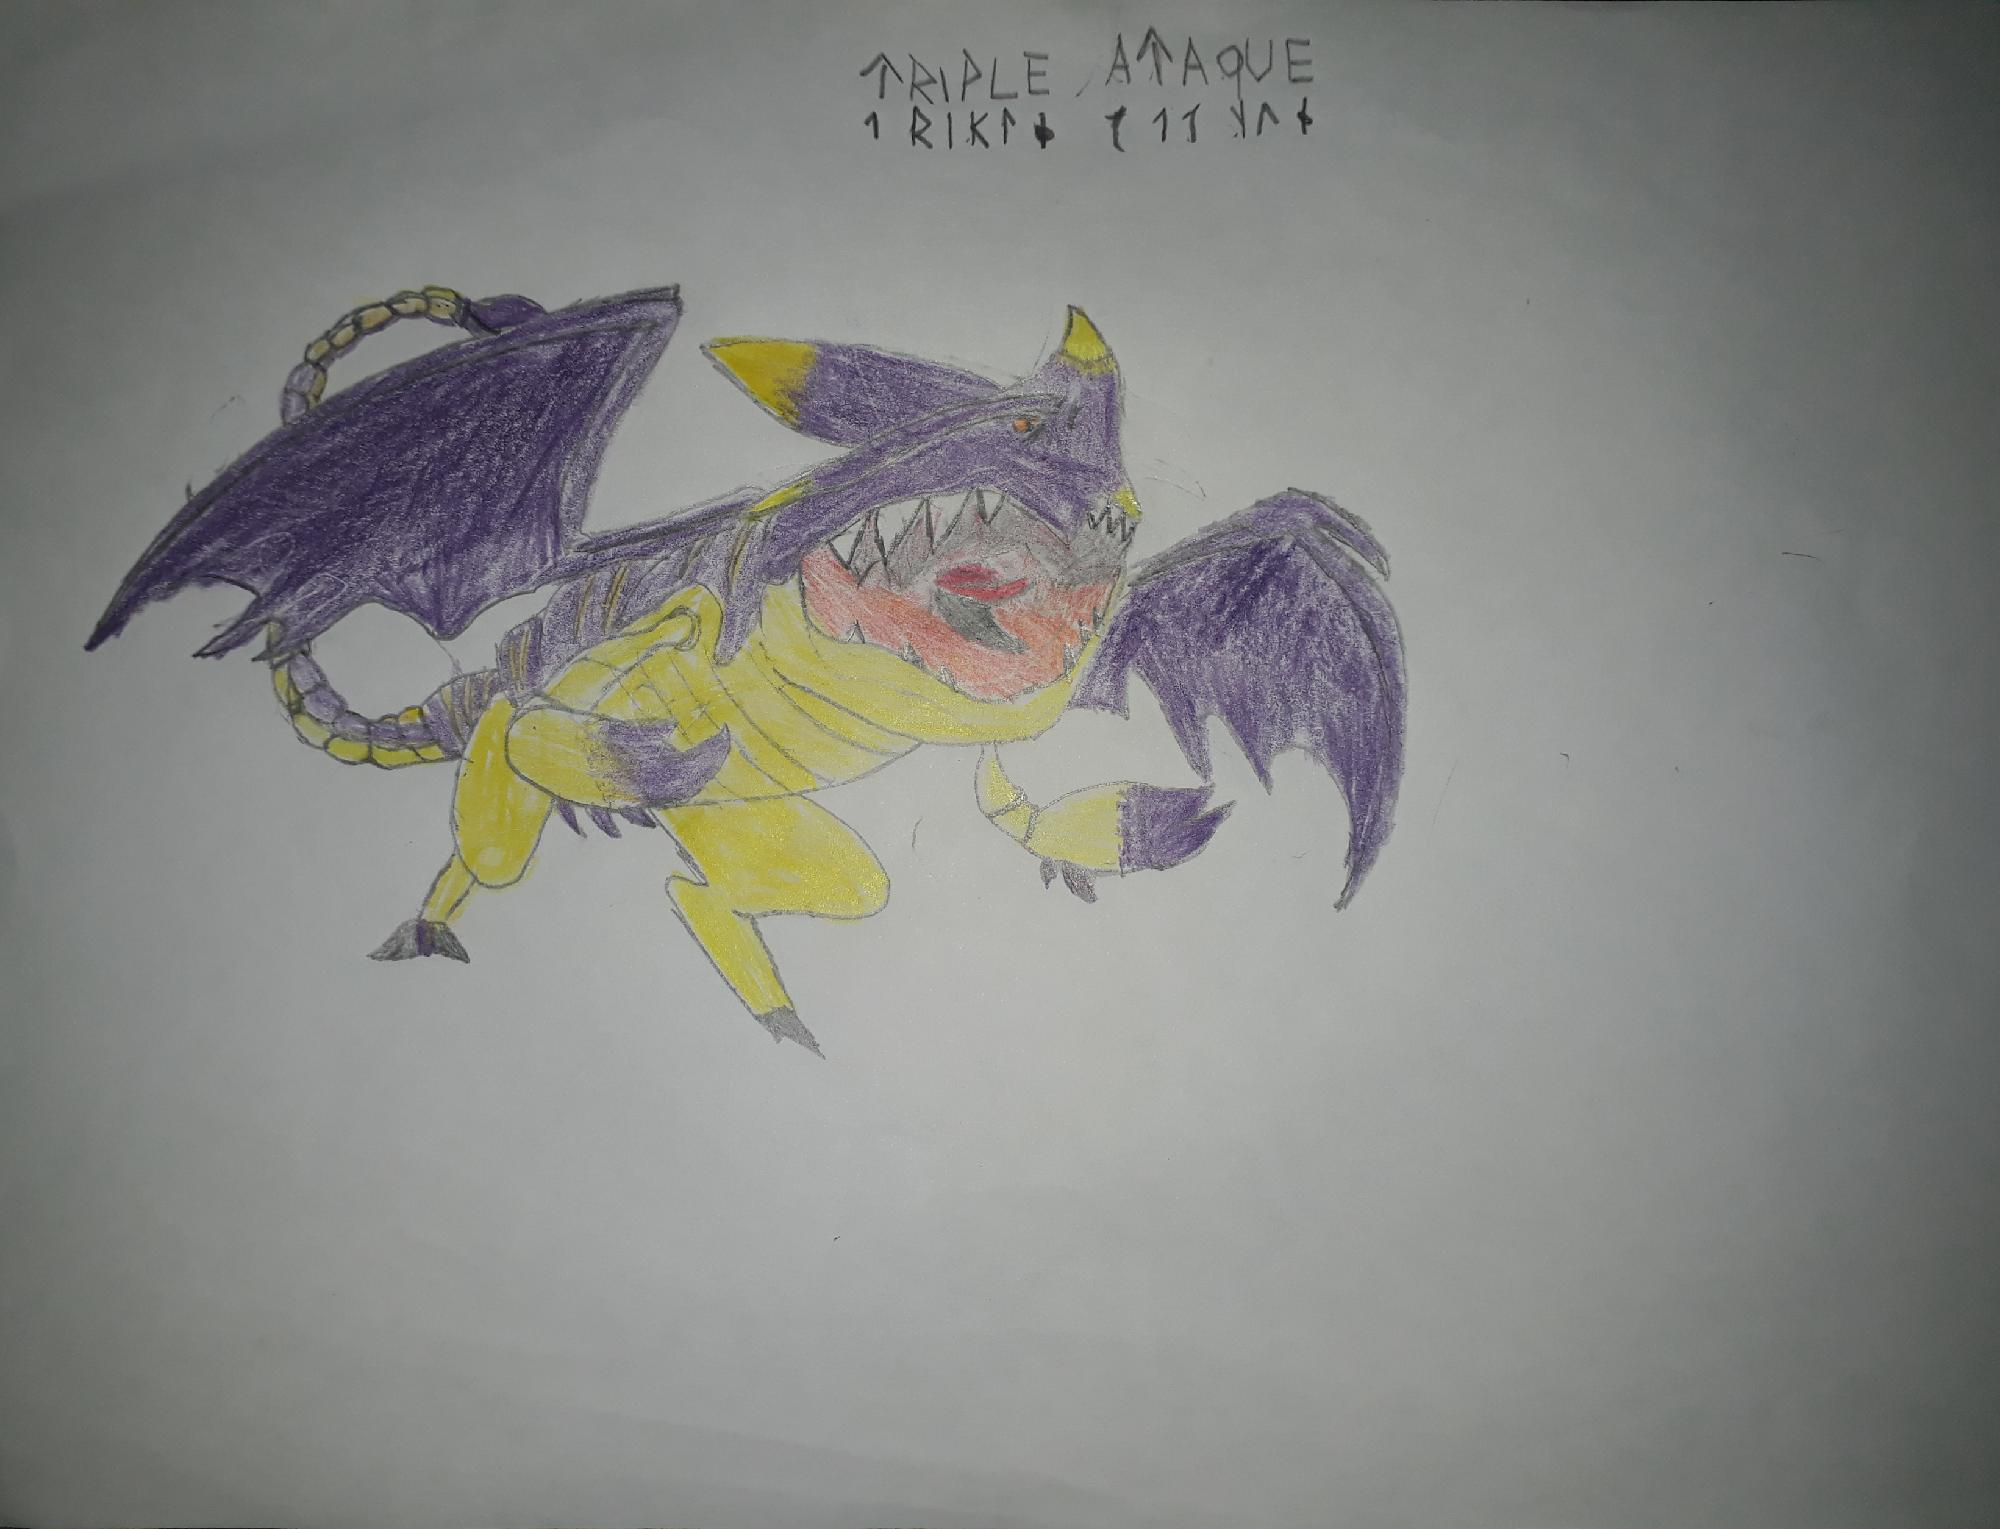 Dragon #8 (triple ataque)